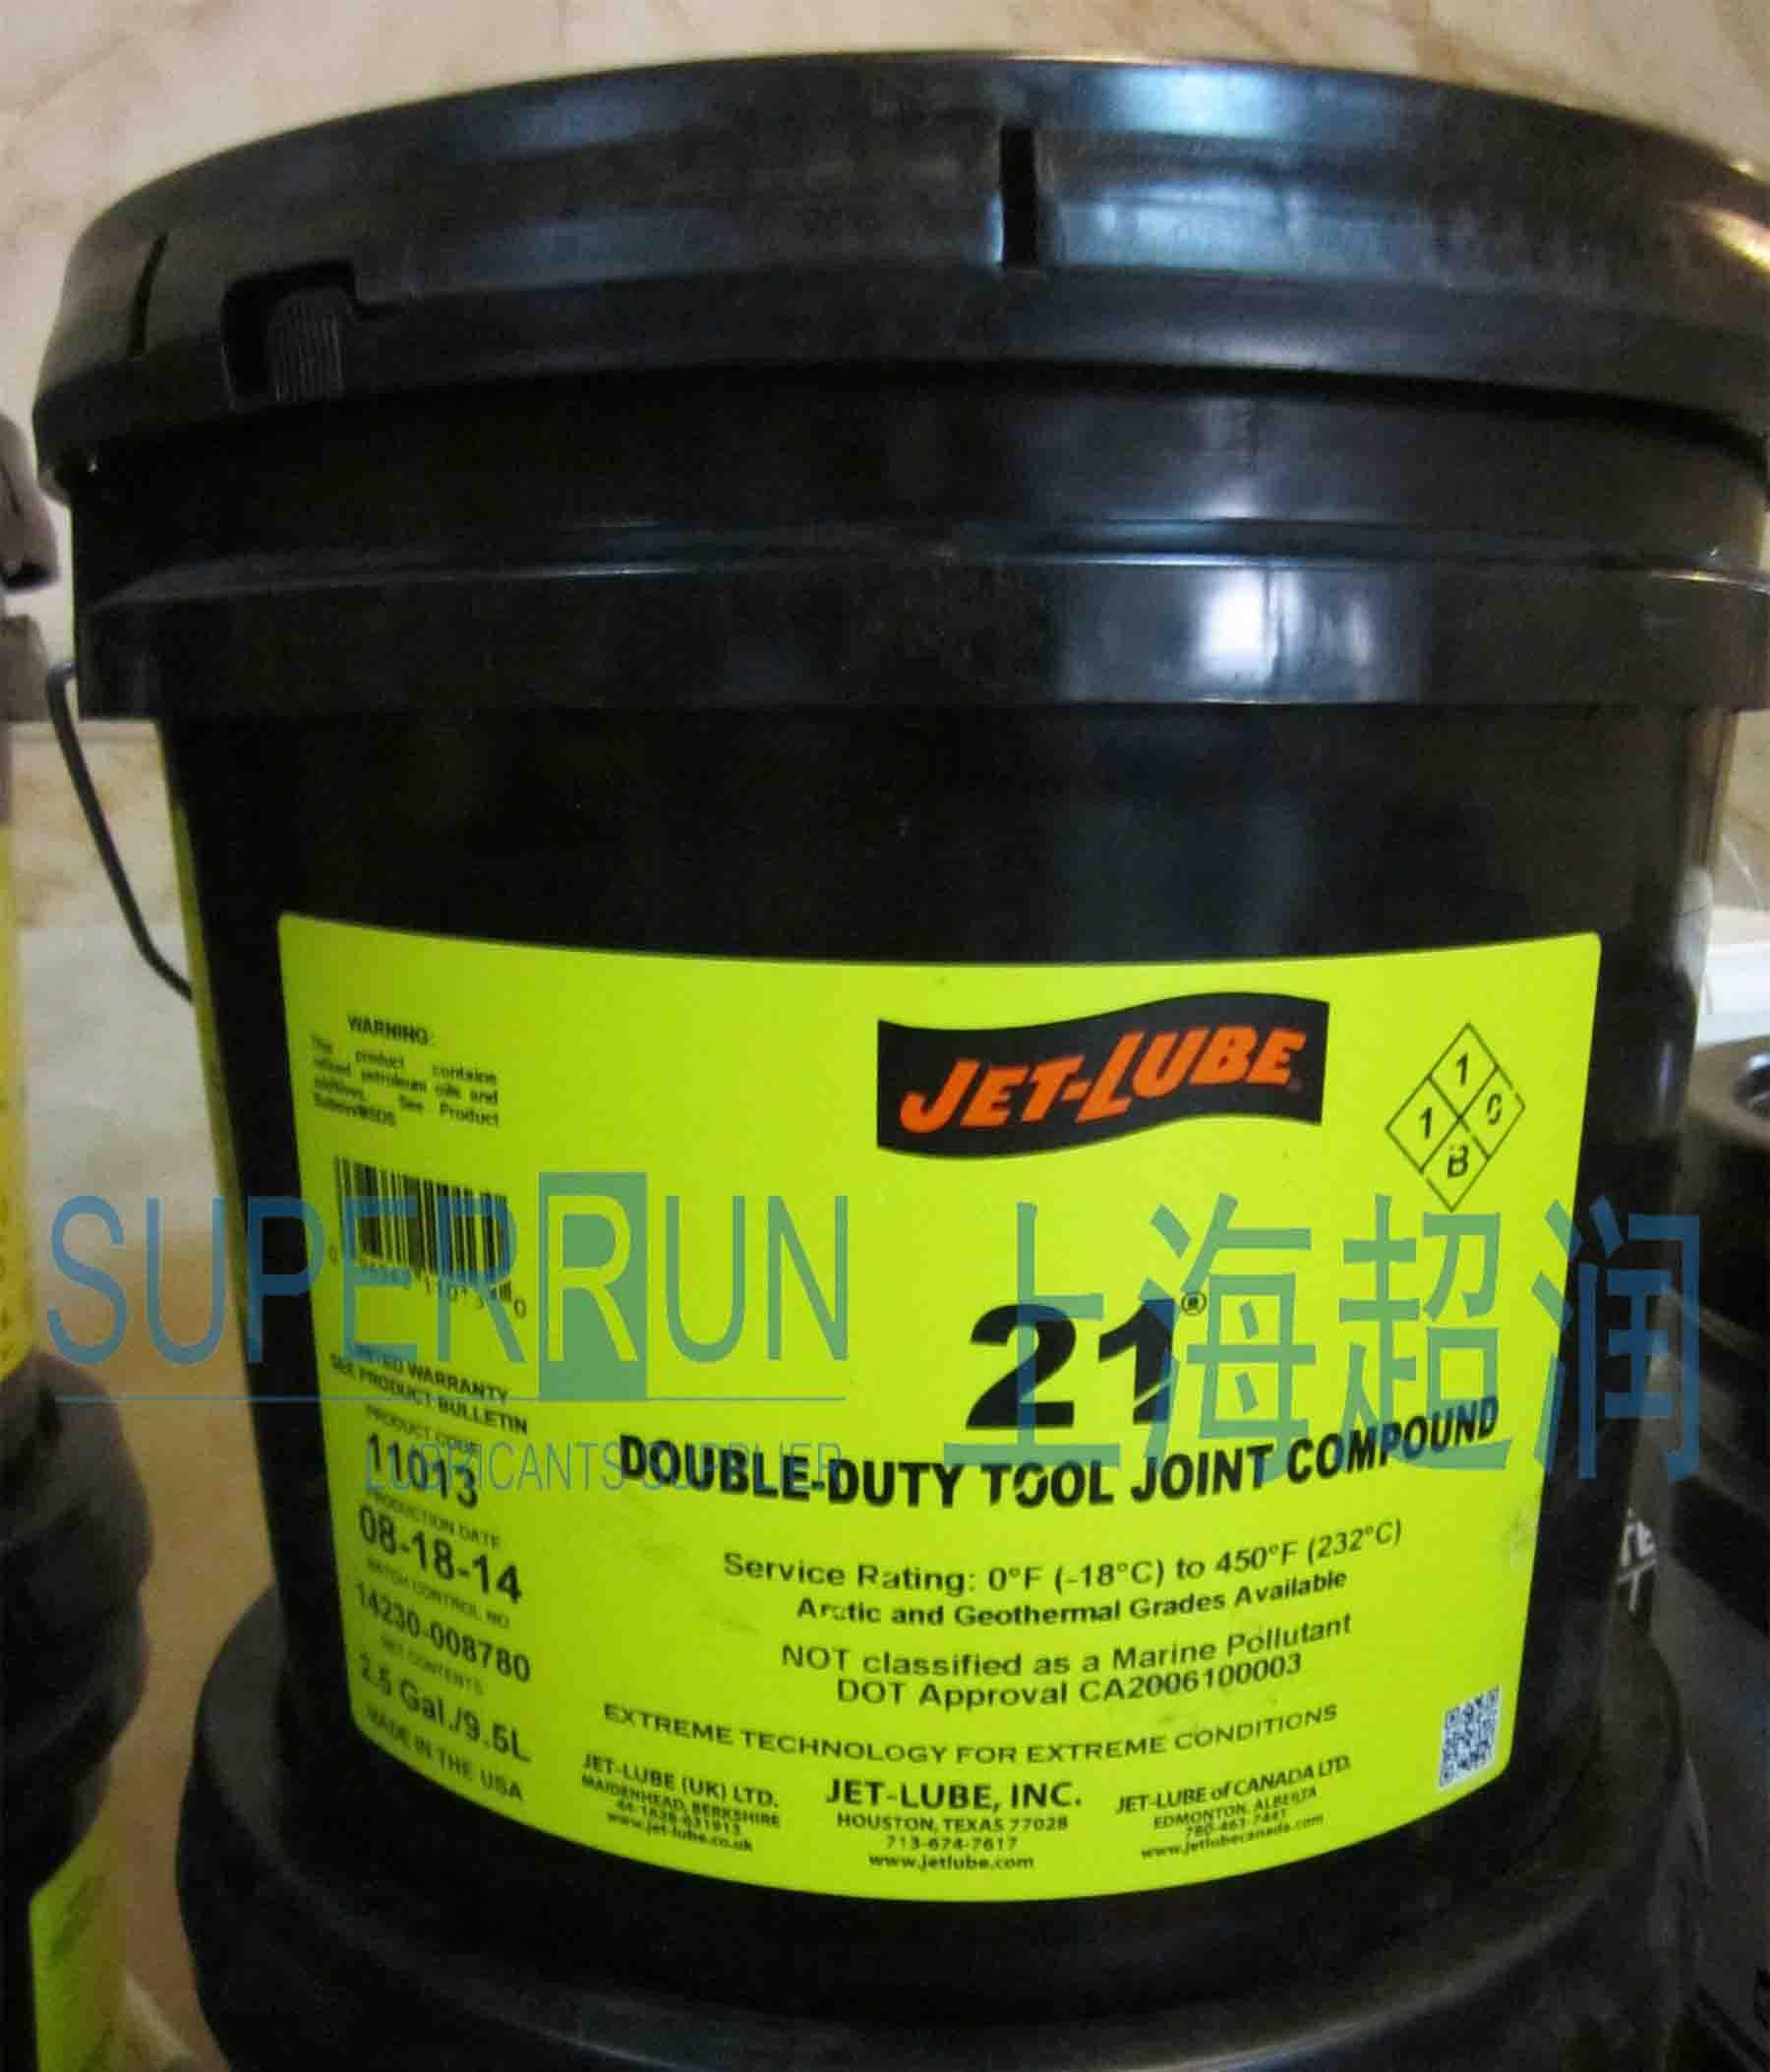 JET-LUBE 21高温丝扣润滑脂